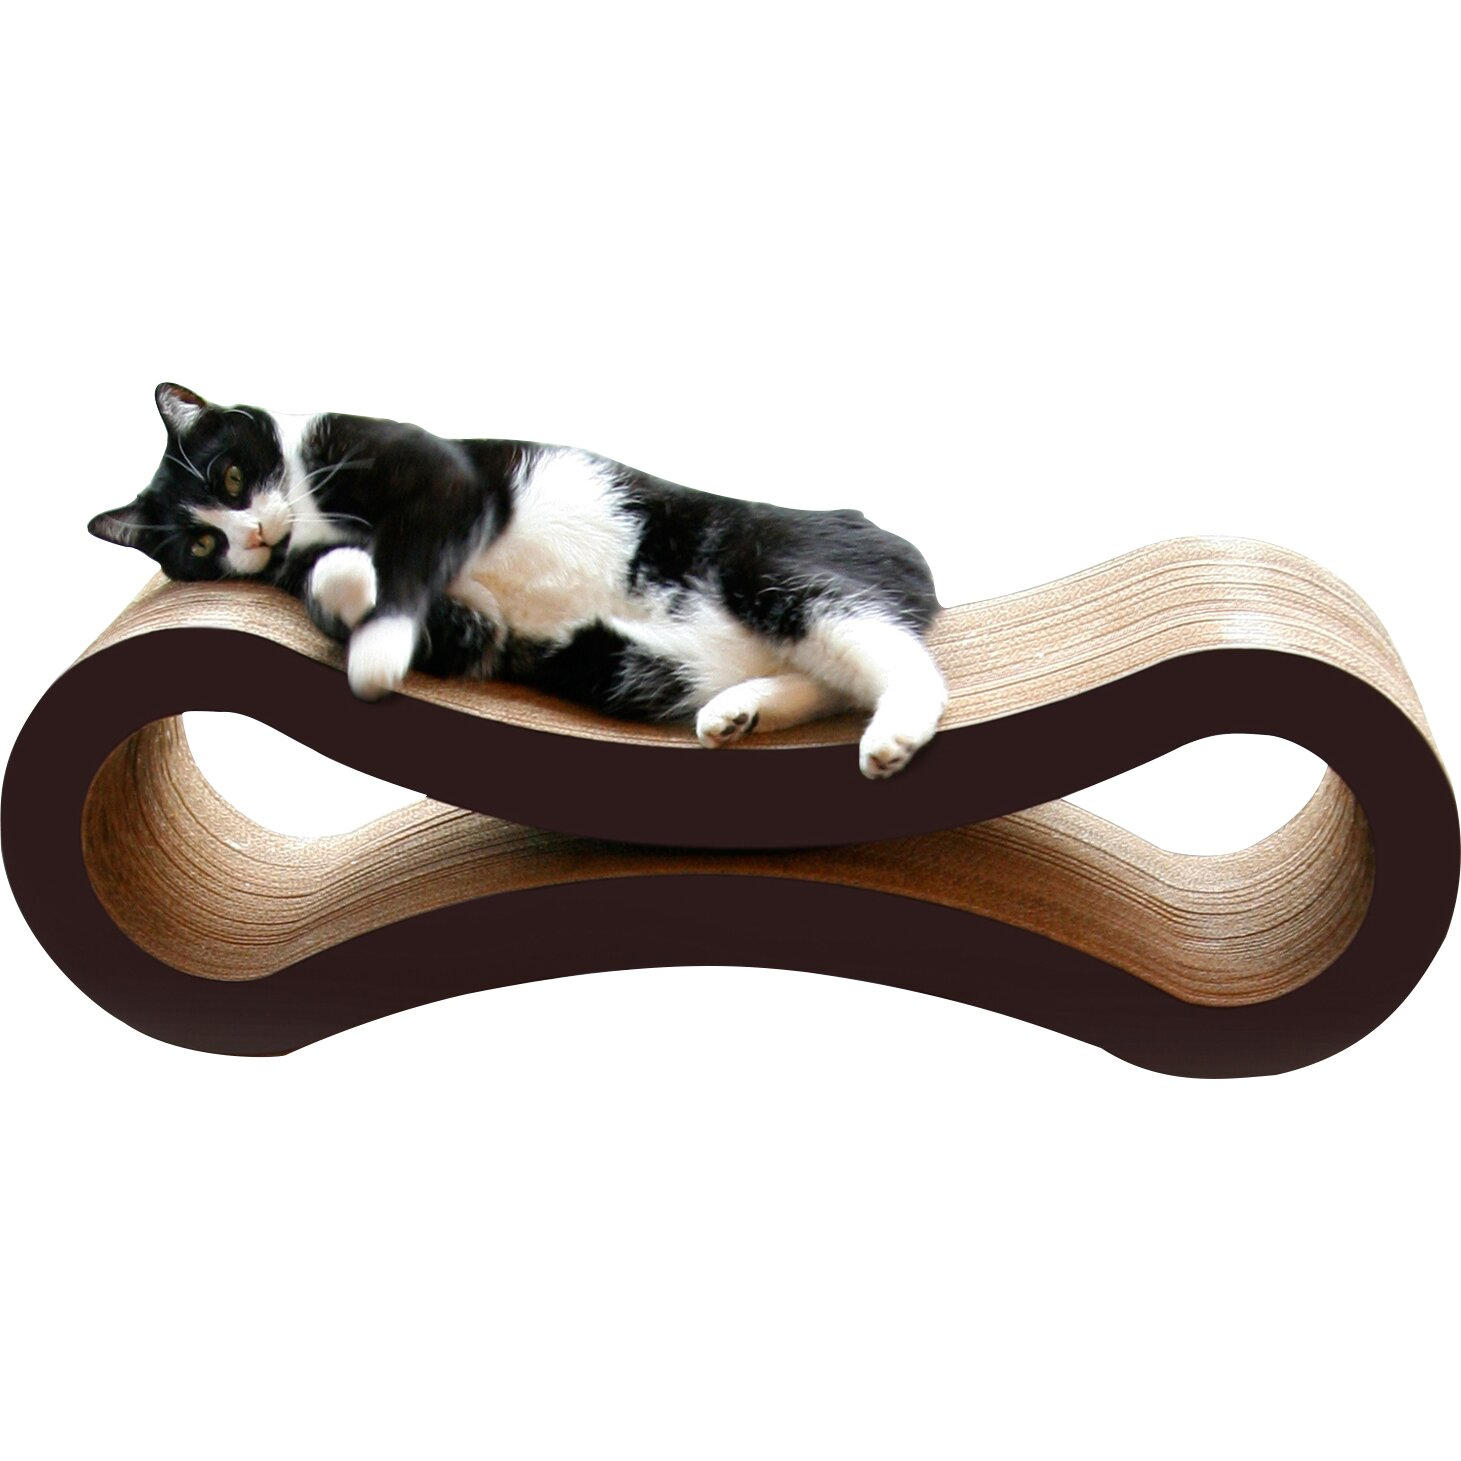 Petfusion ultimate cat scratcher lounge bed reviews wayfair - Cat bed scratcher ...